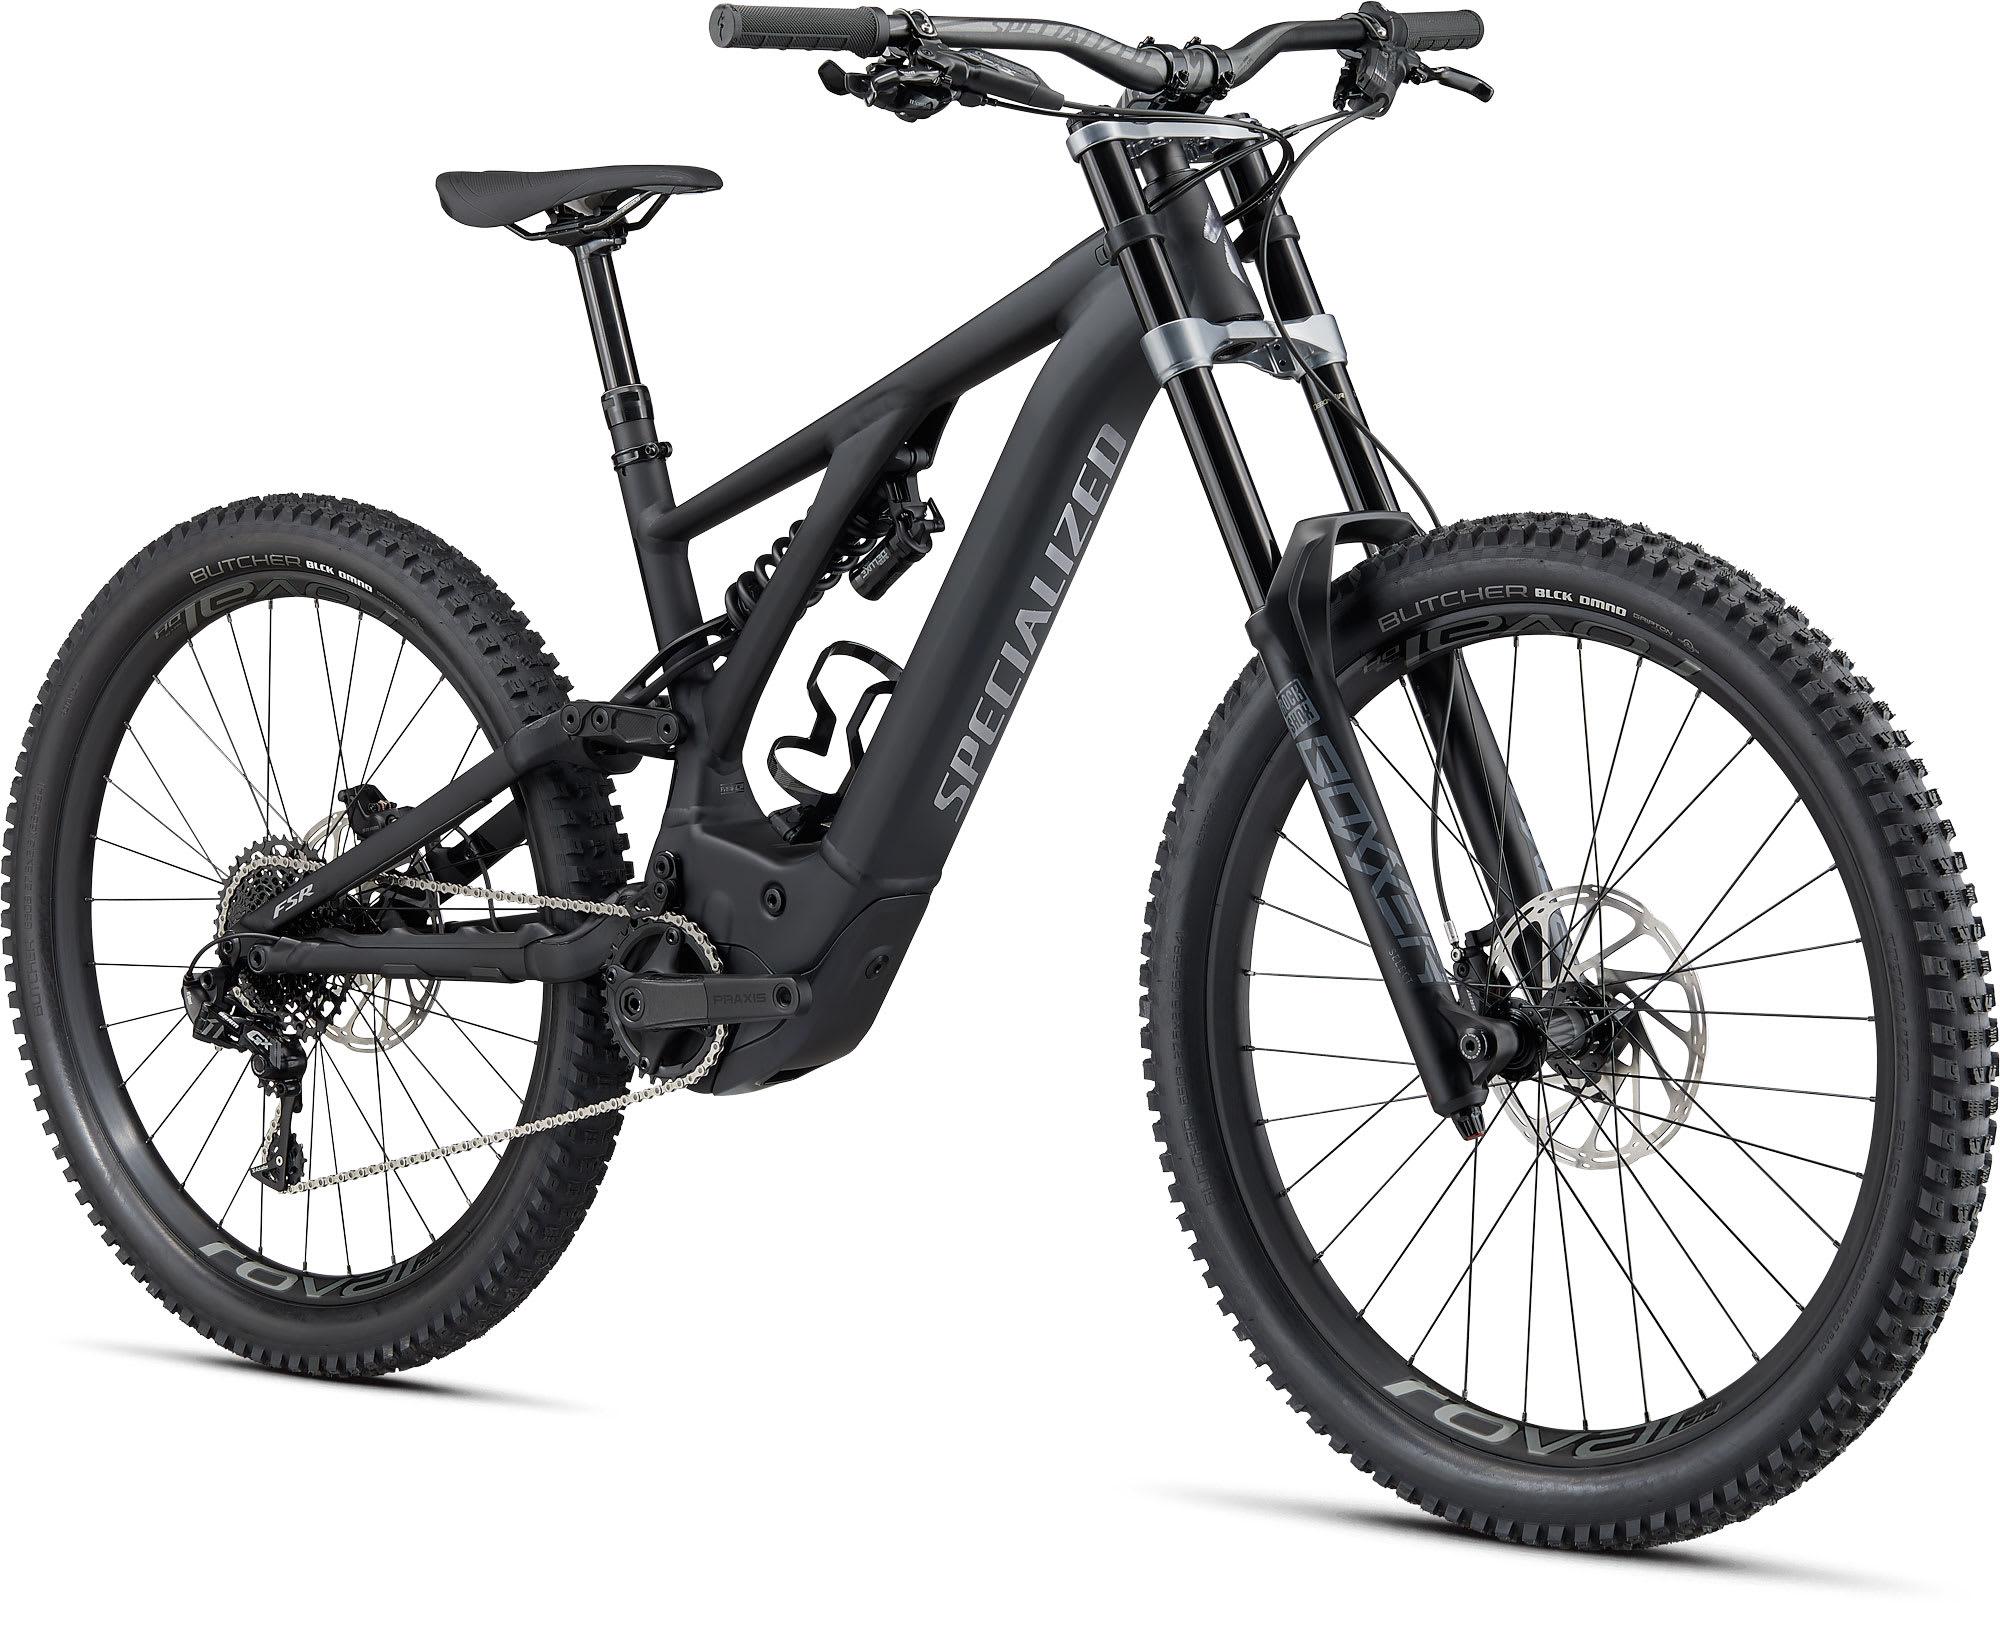 Specialized Mountain Bike Fahrrad günstig kaufen | eBay